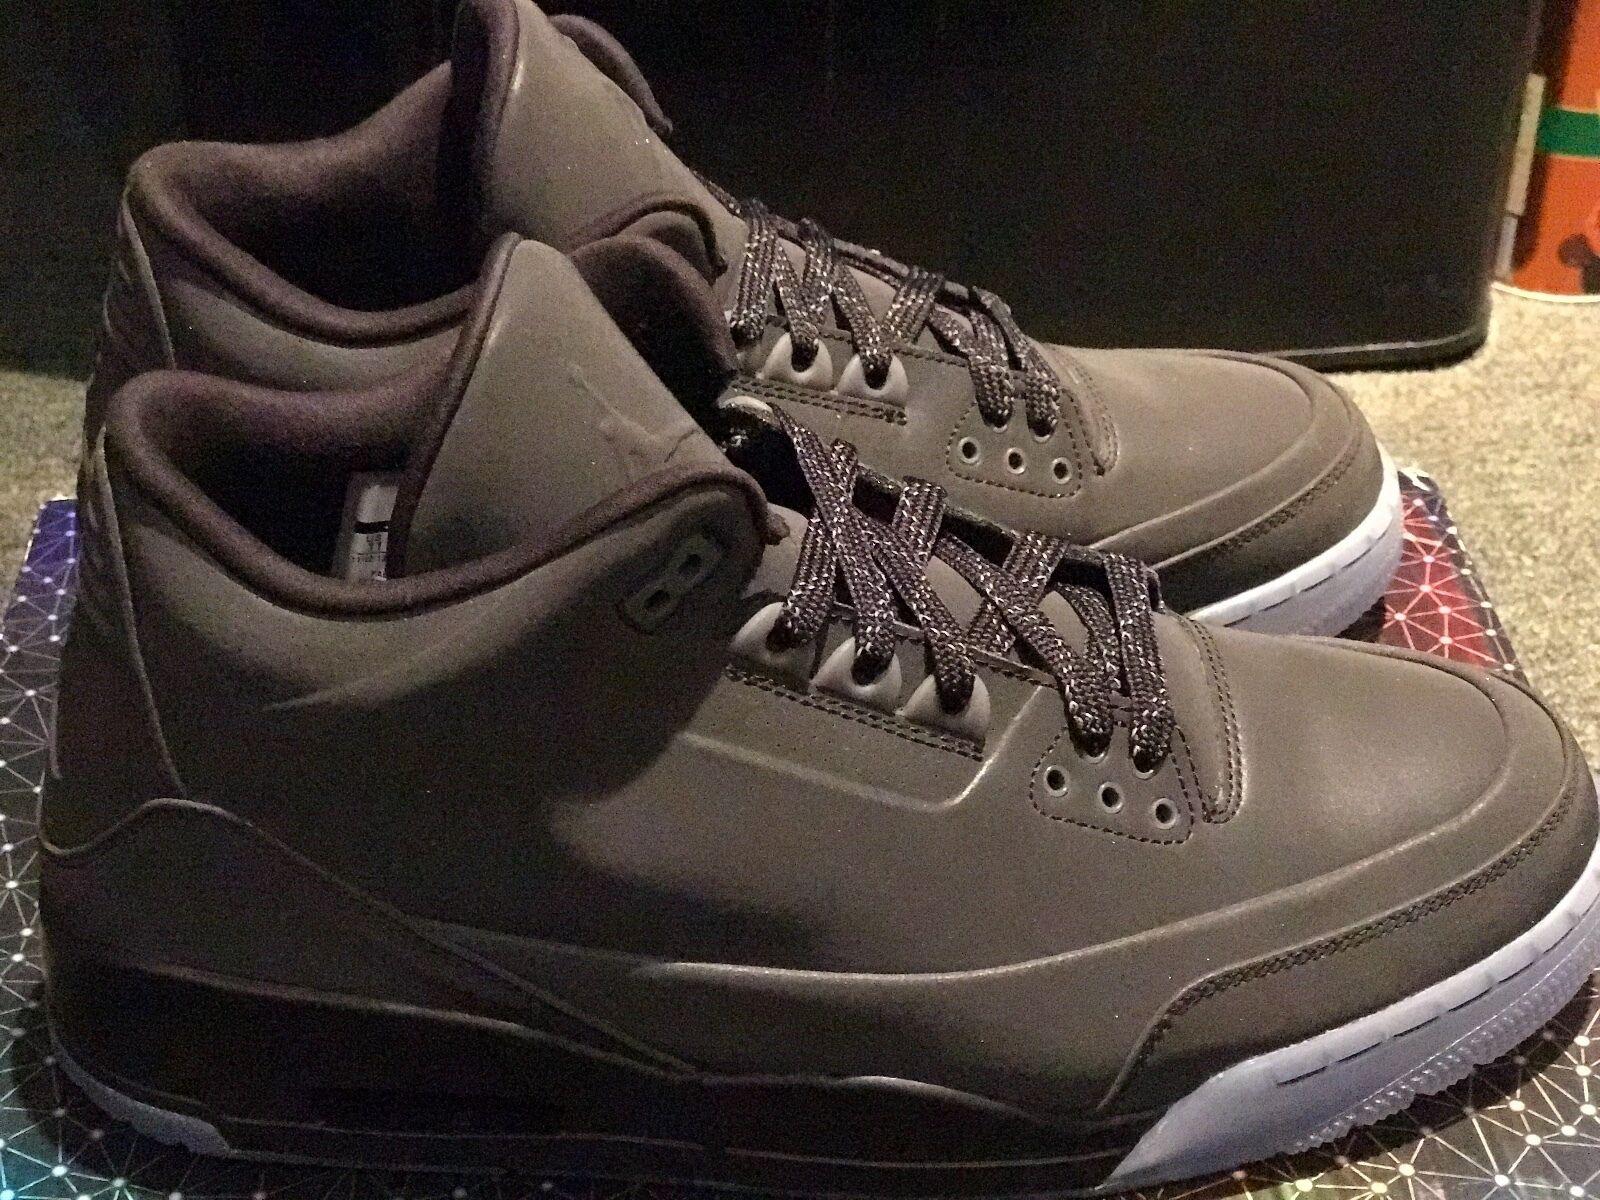 best website 77b1a ba85c Air Mens Jordan 11 Black color - Size - 3 Lab 5 ...